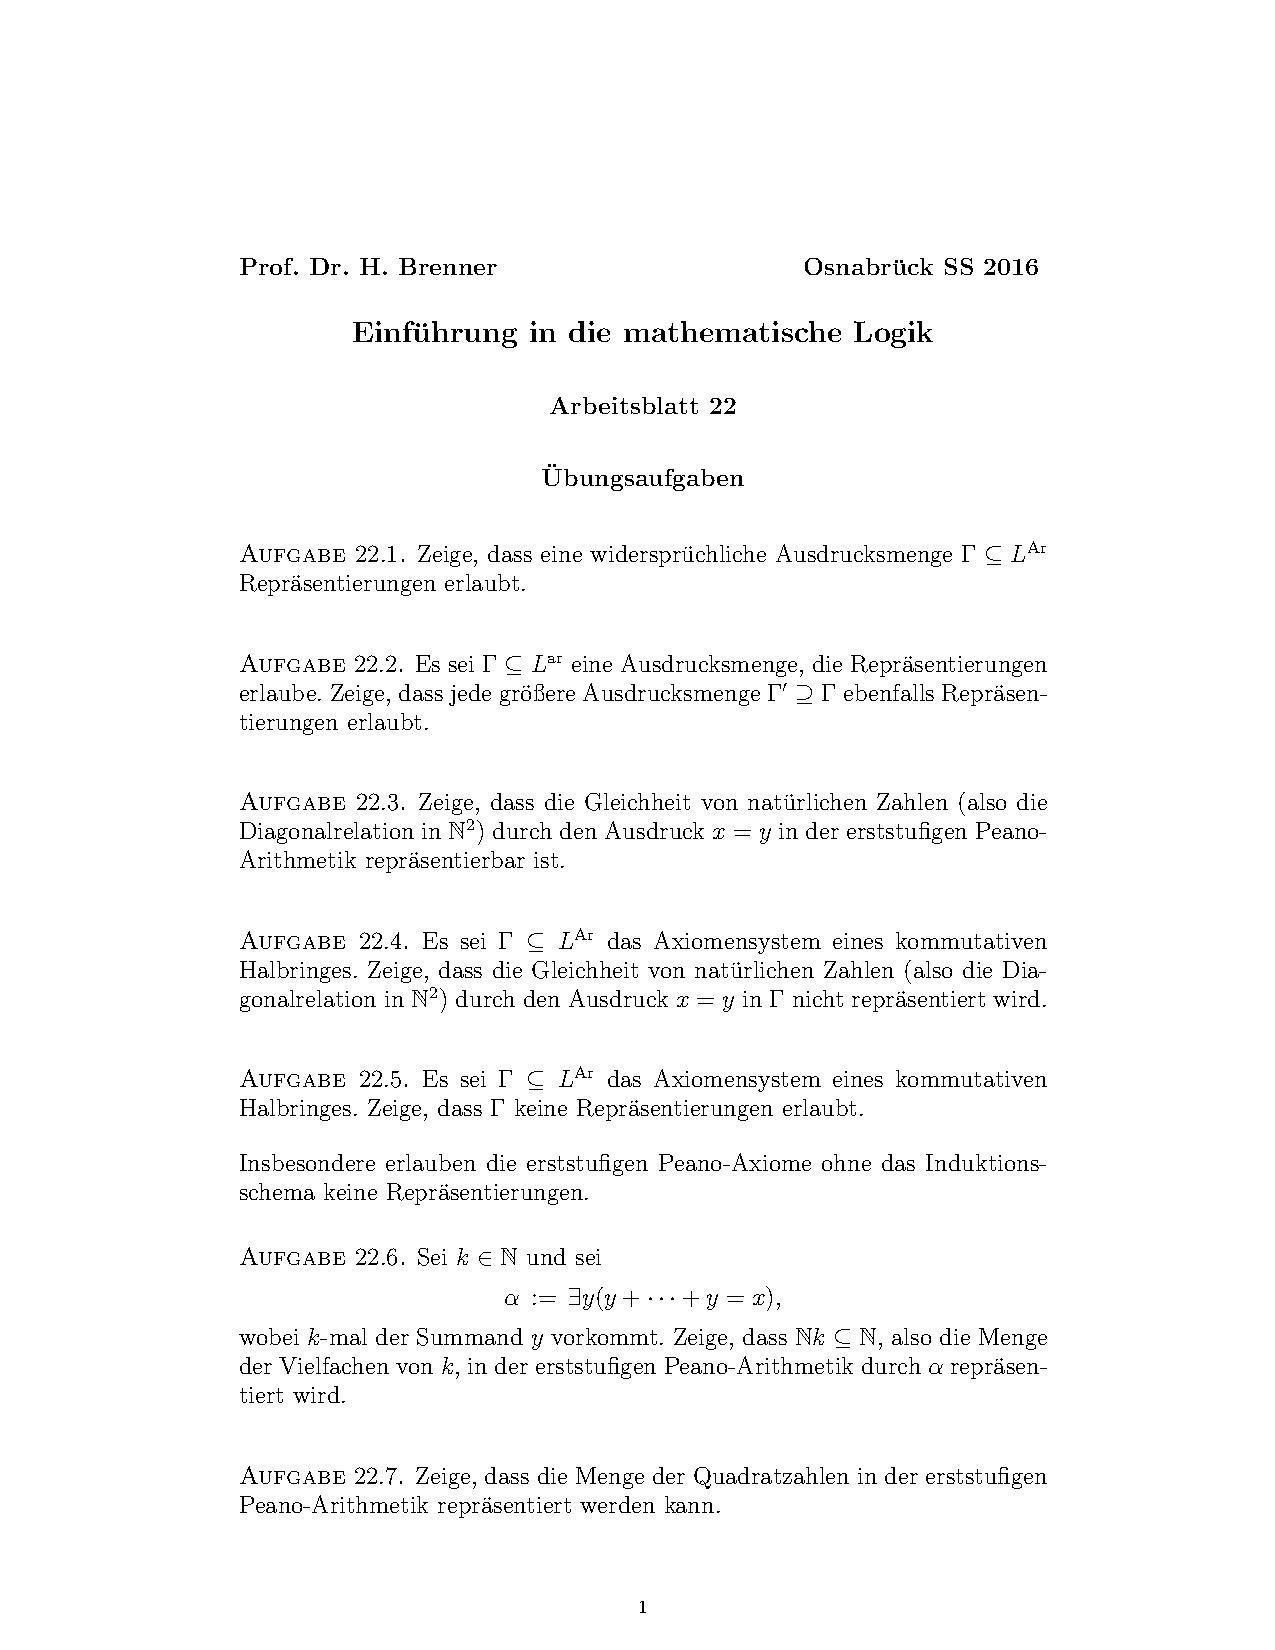 Atemberaubend Fehlende Zahlen Arbeitsblatt Für Kindergärten Ideen ...